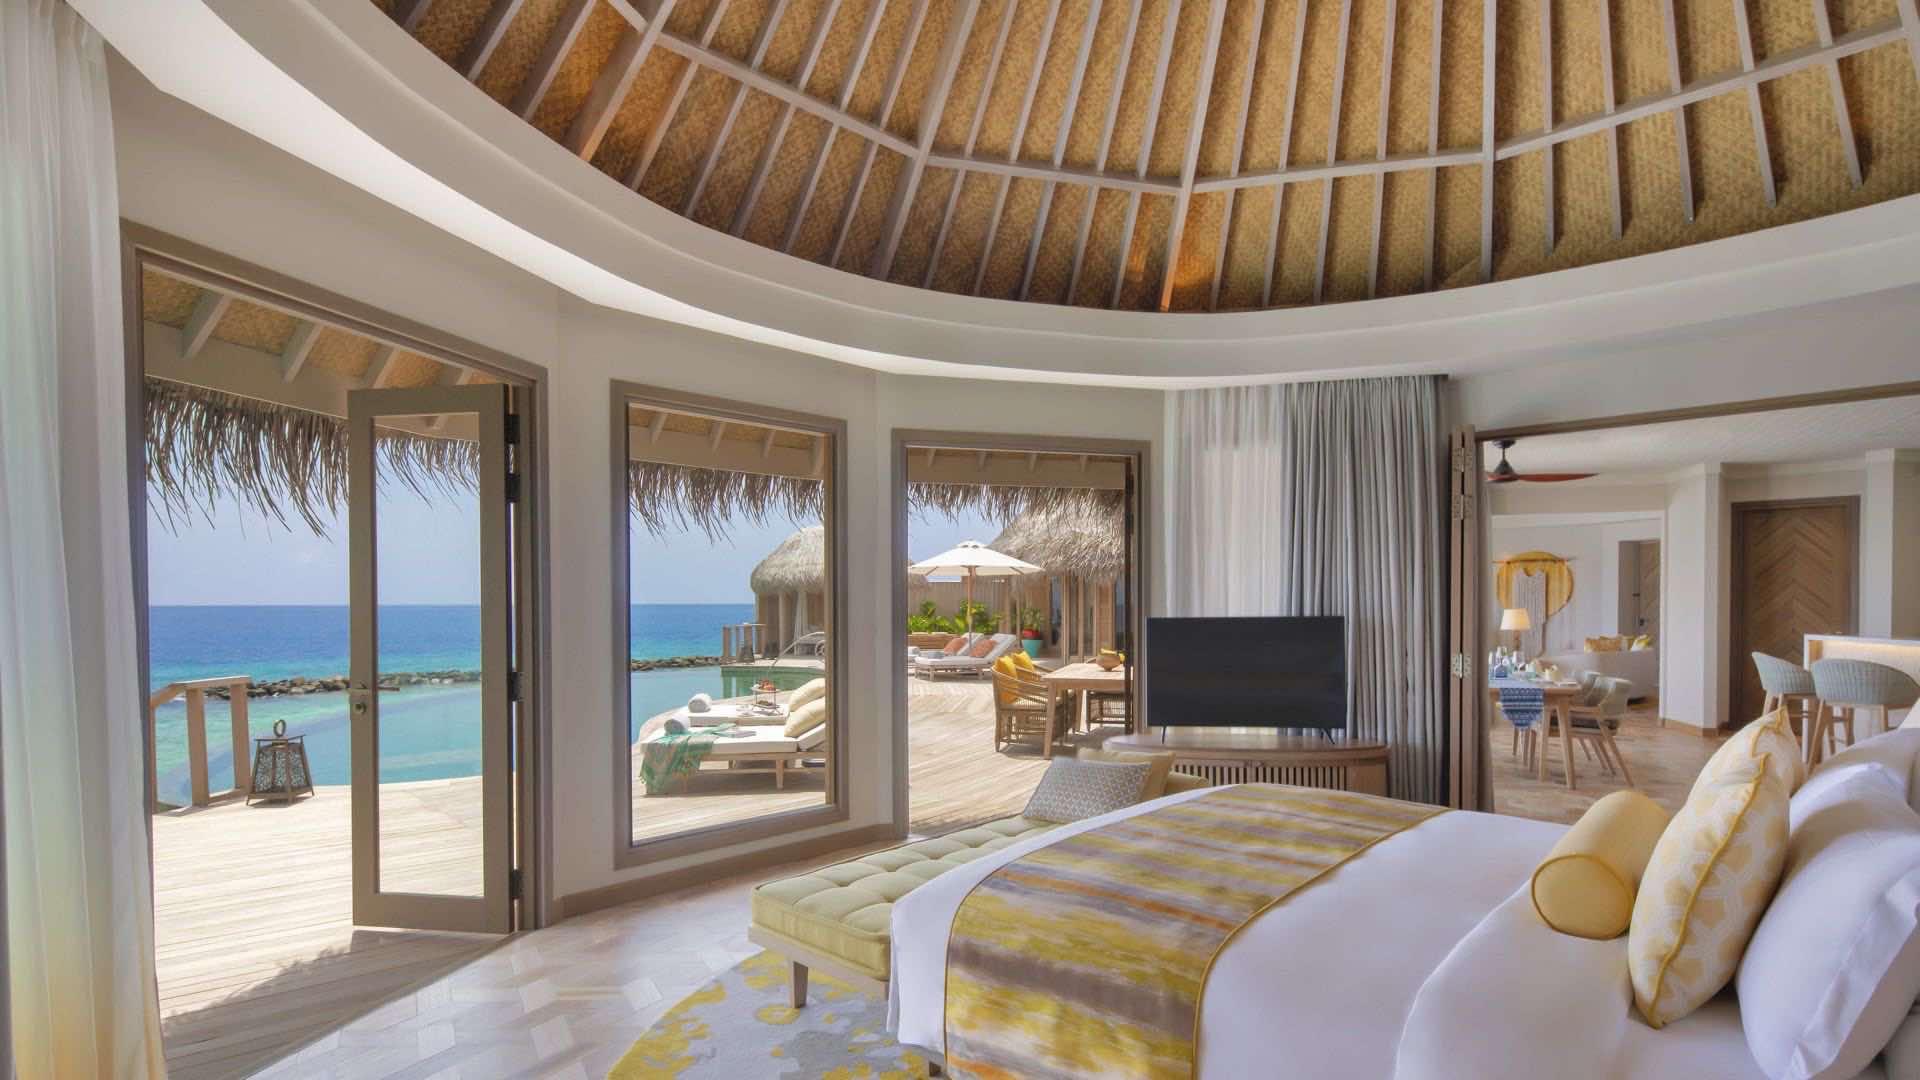 Resort Maldive The Nautilus Maldives residence